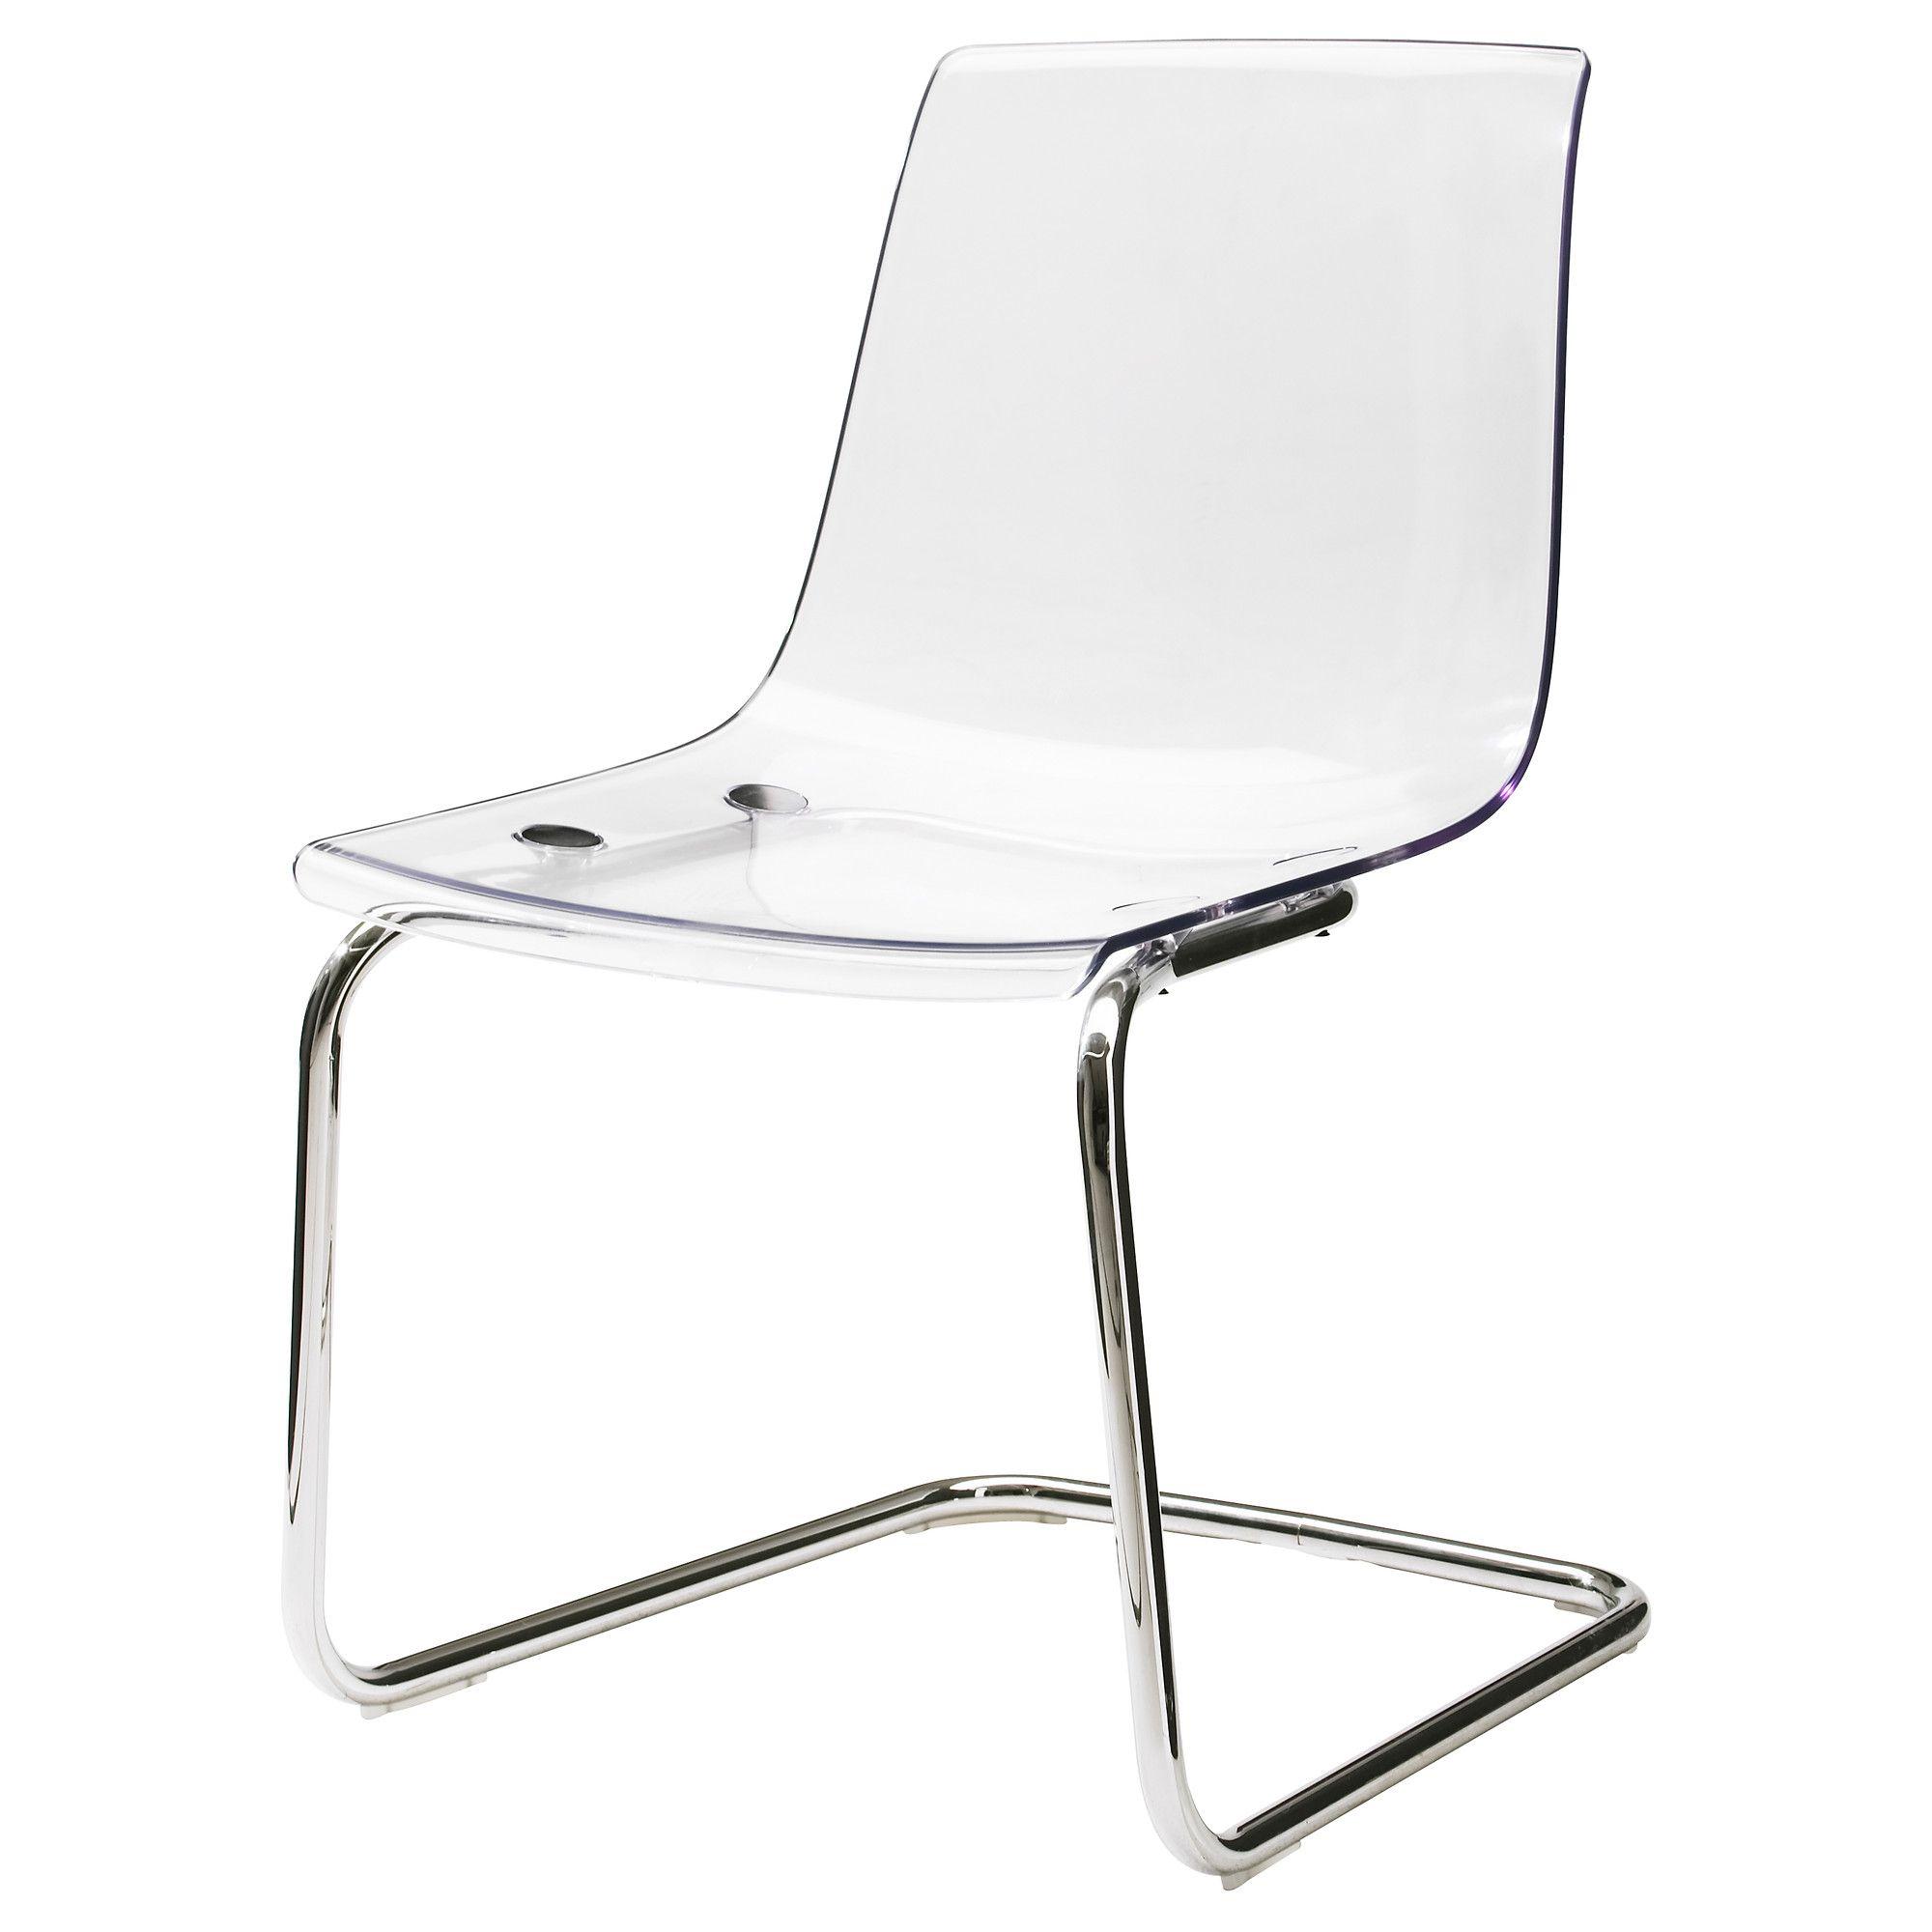 Metal Dining Chairs Ikea Banquet Chair Covers Wholesale In Malaysia Hej Bei Osterreich 2019 Trpezarija Pinterest Tobias Stuhl Transparent Verchromt